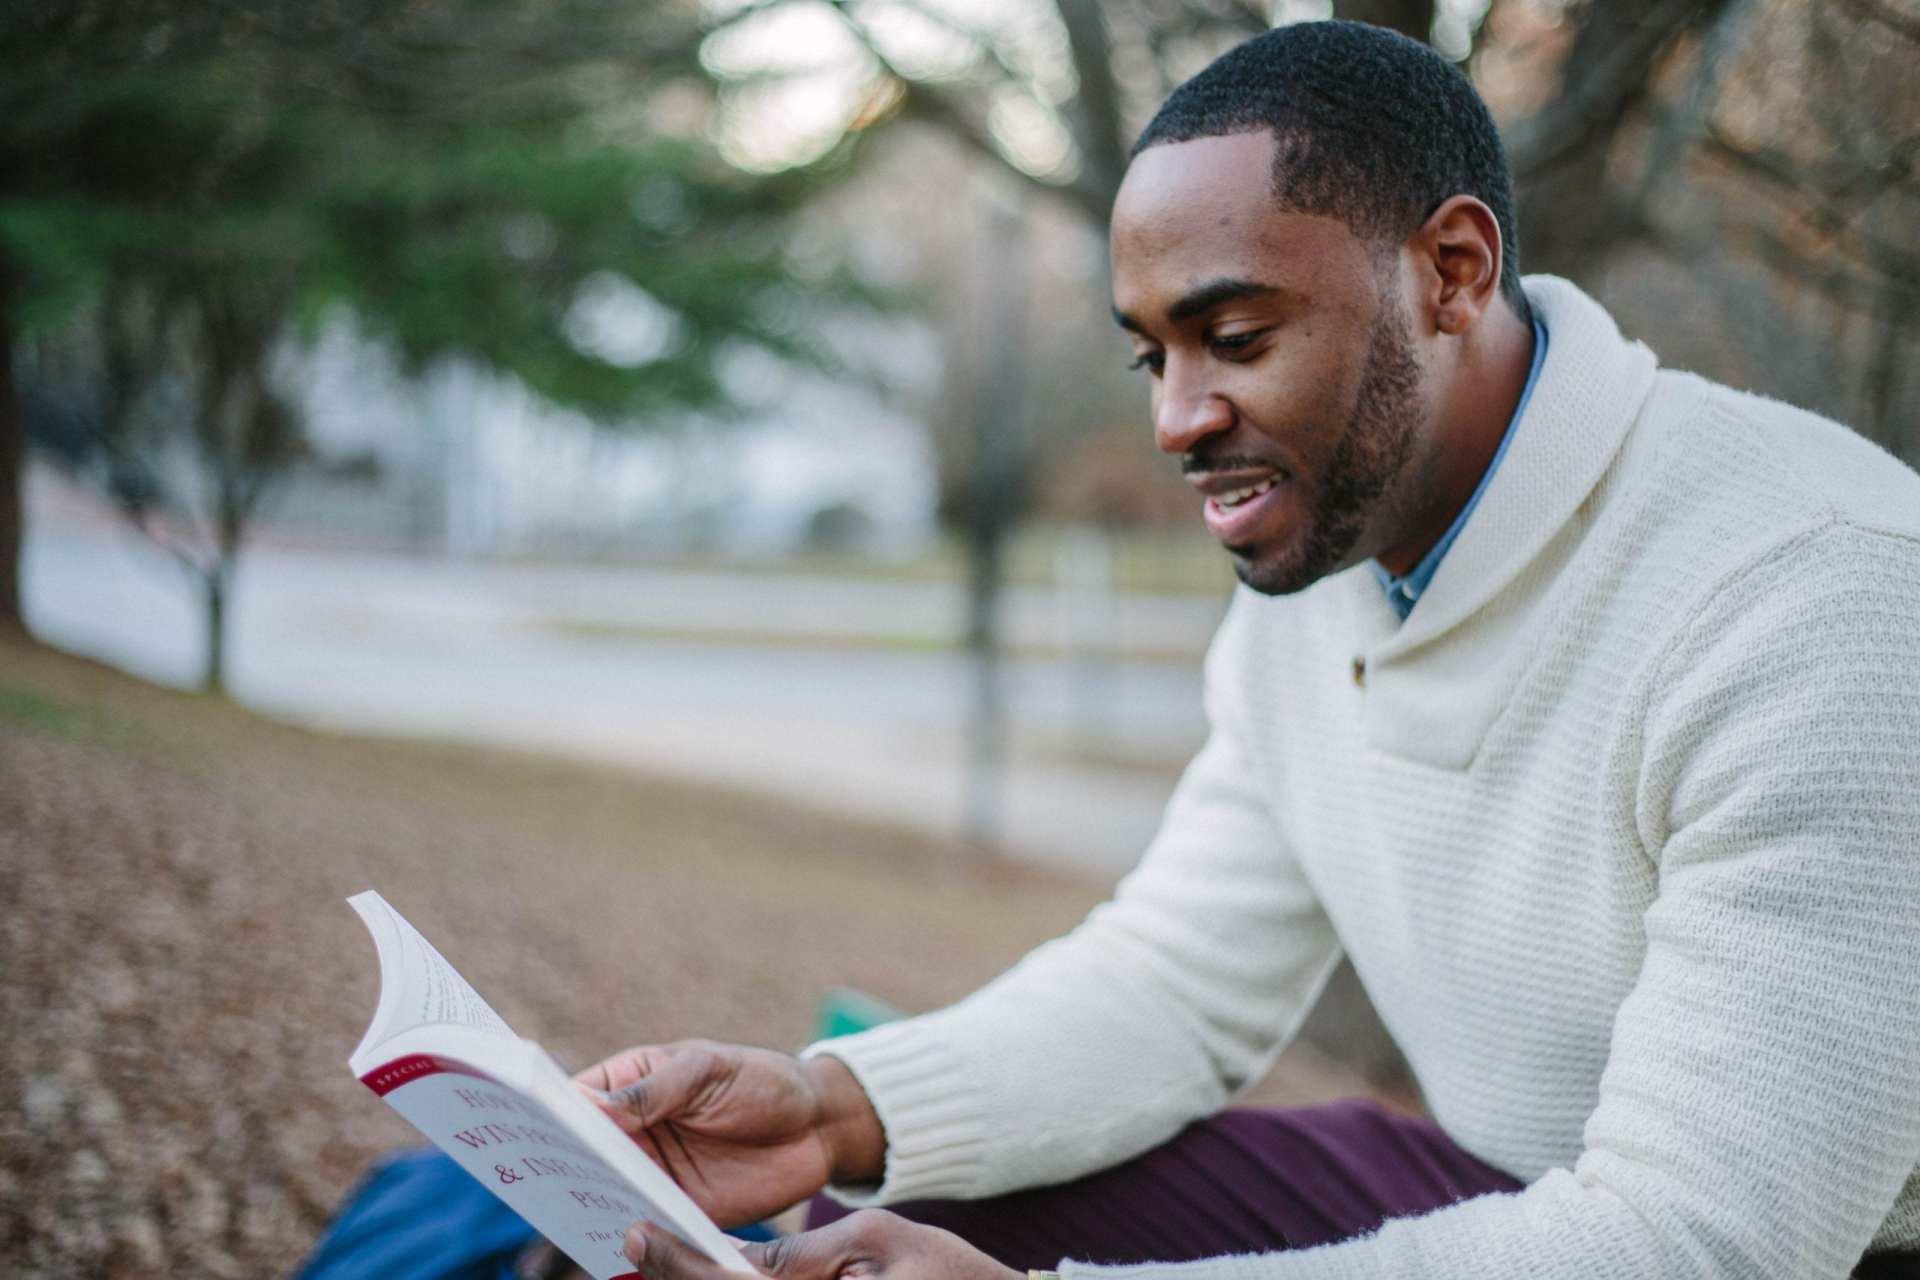 Man-Wearing-White-Sweater-While-Reading-Book_roq0jNCb6tuQ